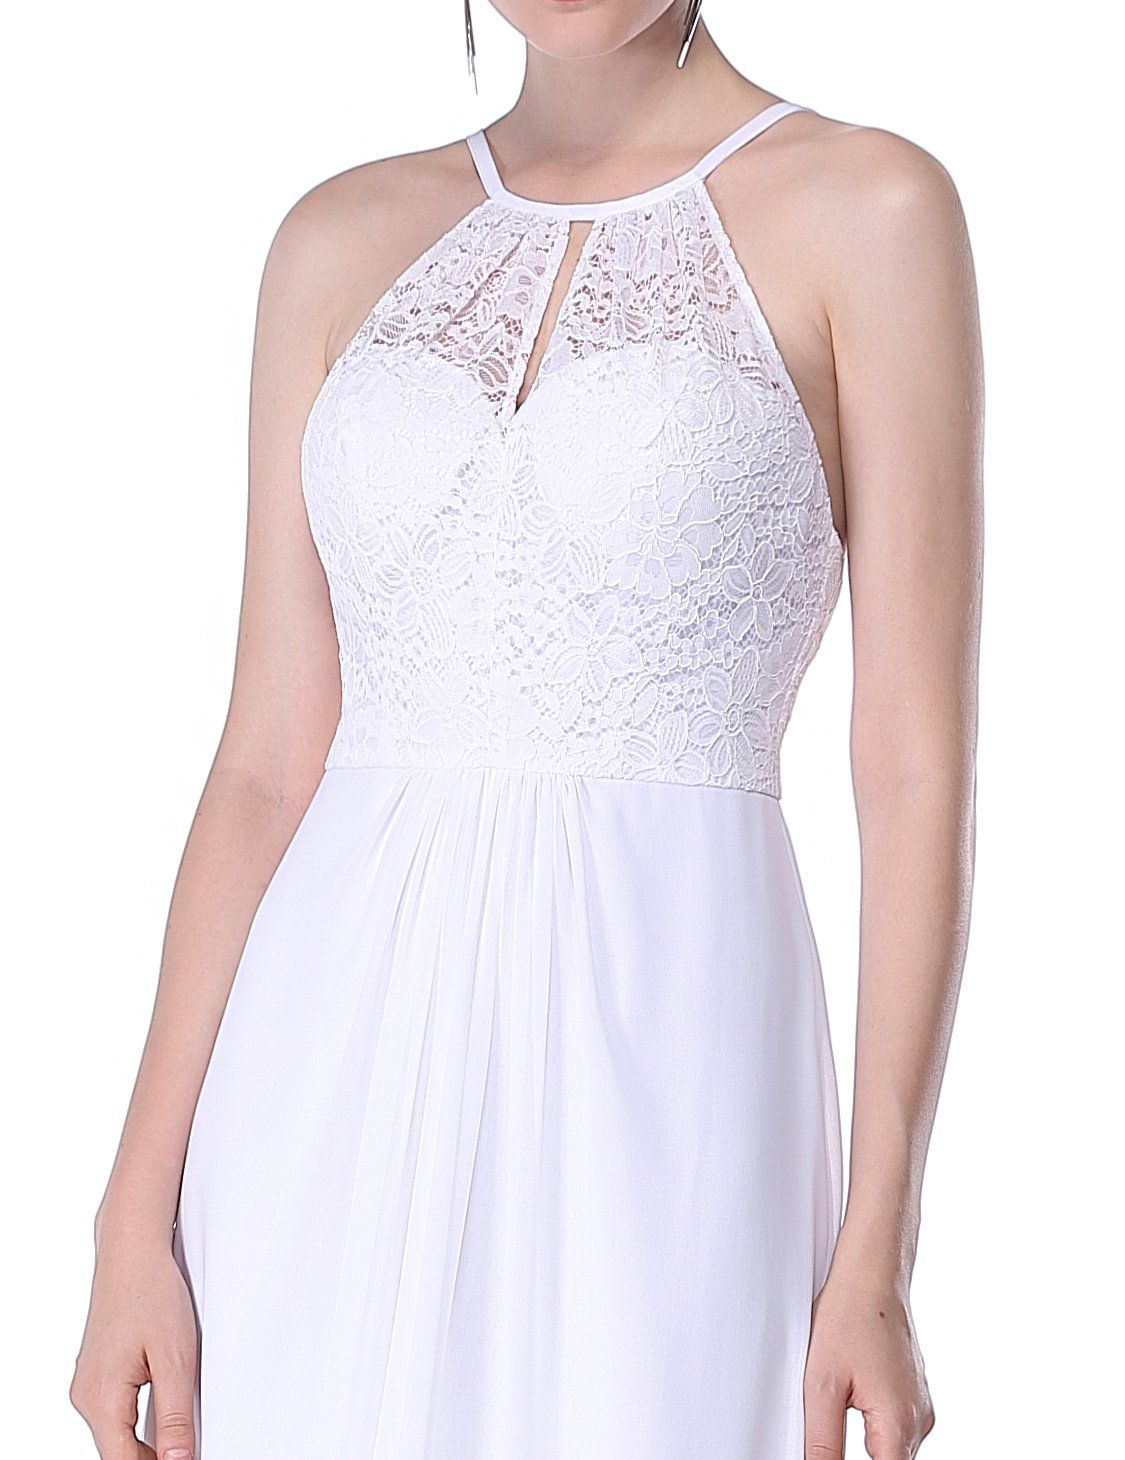 Everpretty womens lace jewel neckline long empire waist simple